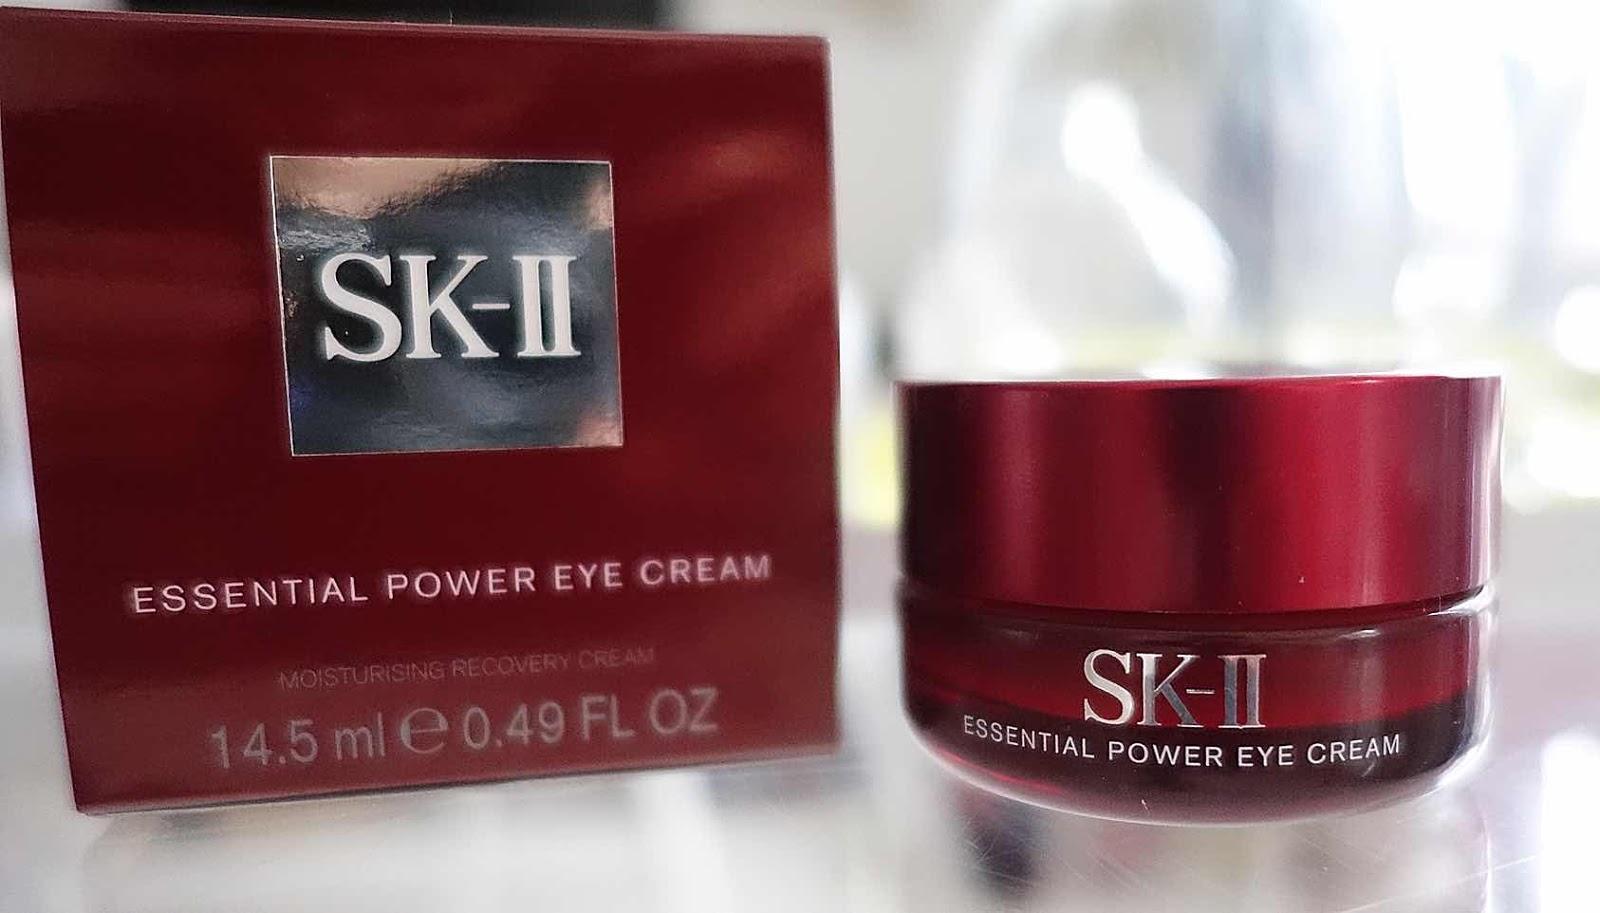 SK-II-Essential-Power-Eye-Cream-Review